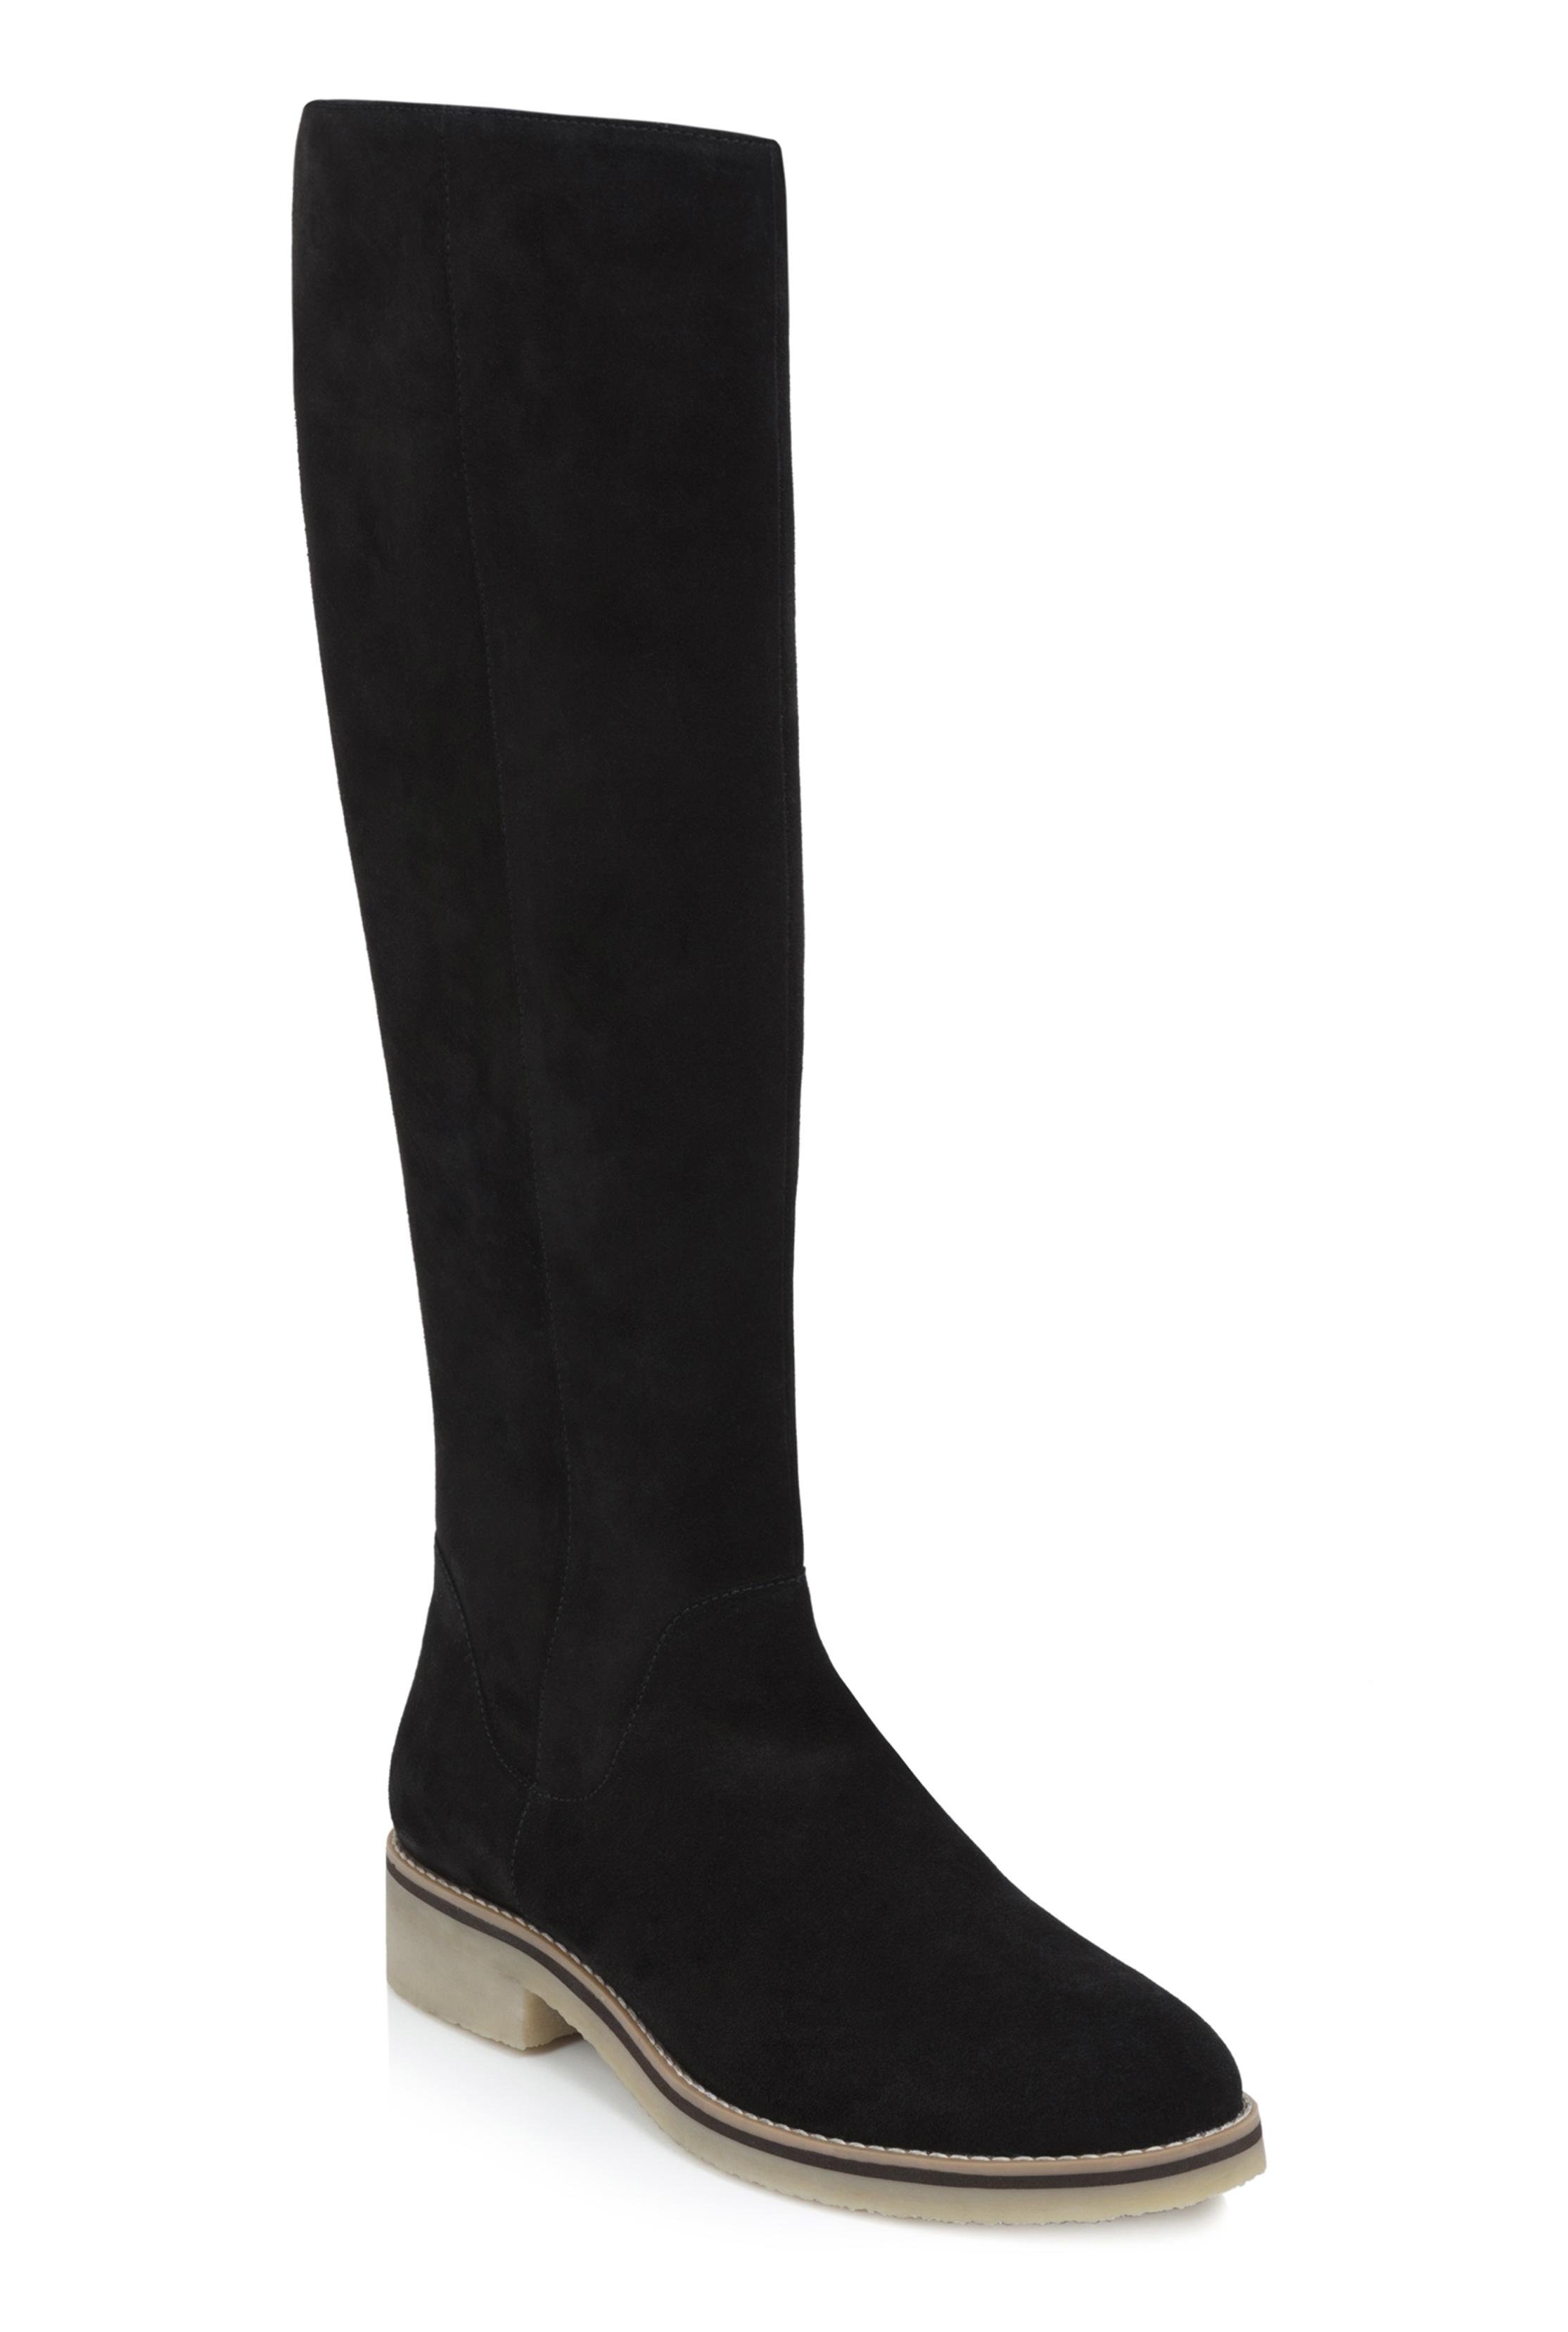 LTS Rita Knee High Suede Boot